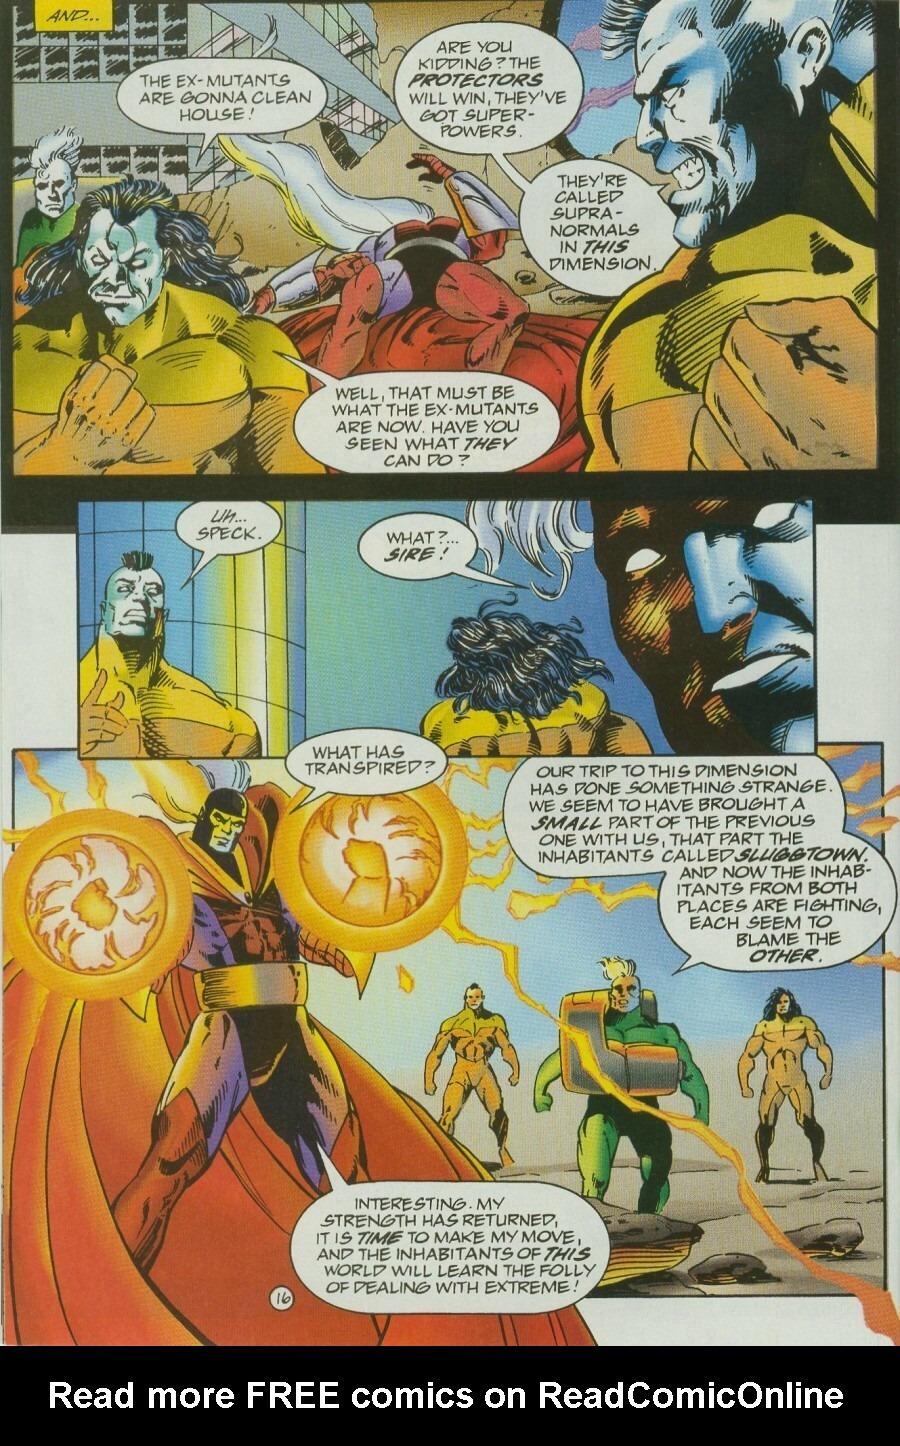 Read online Ex-Mutants comic -  Issue #12 - 19